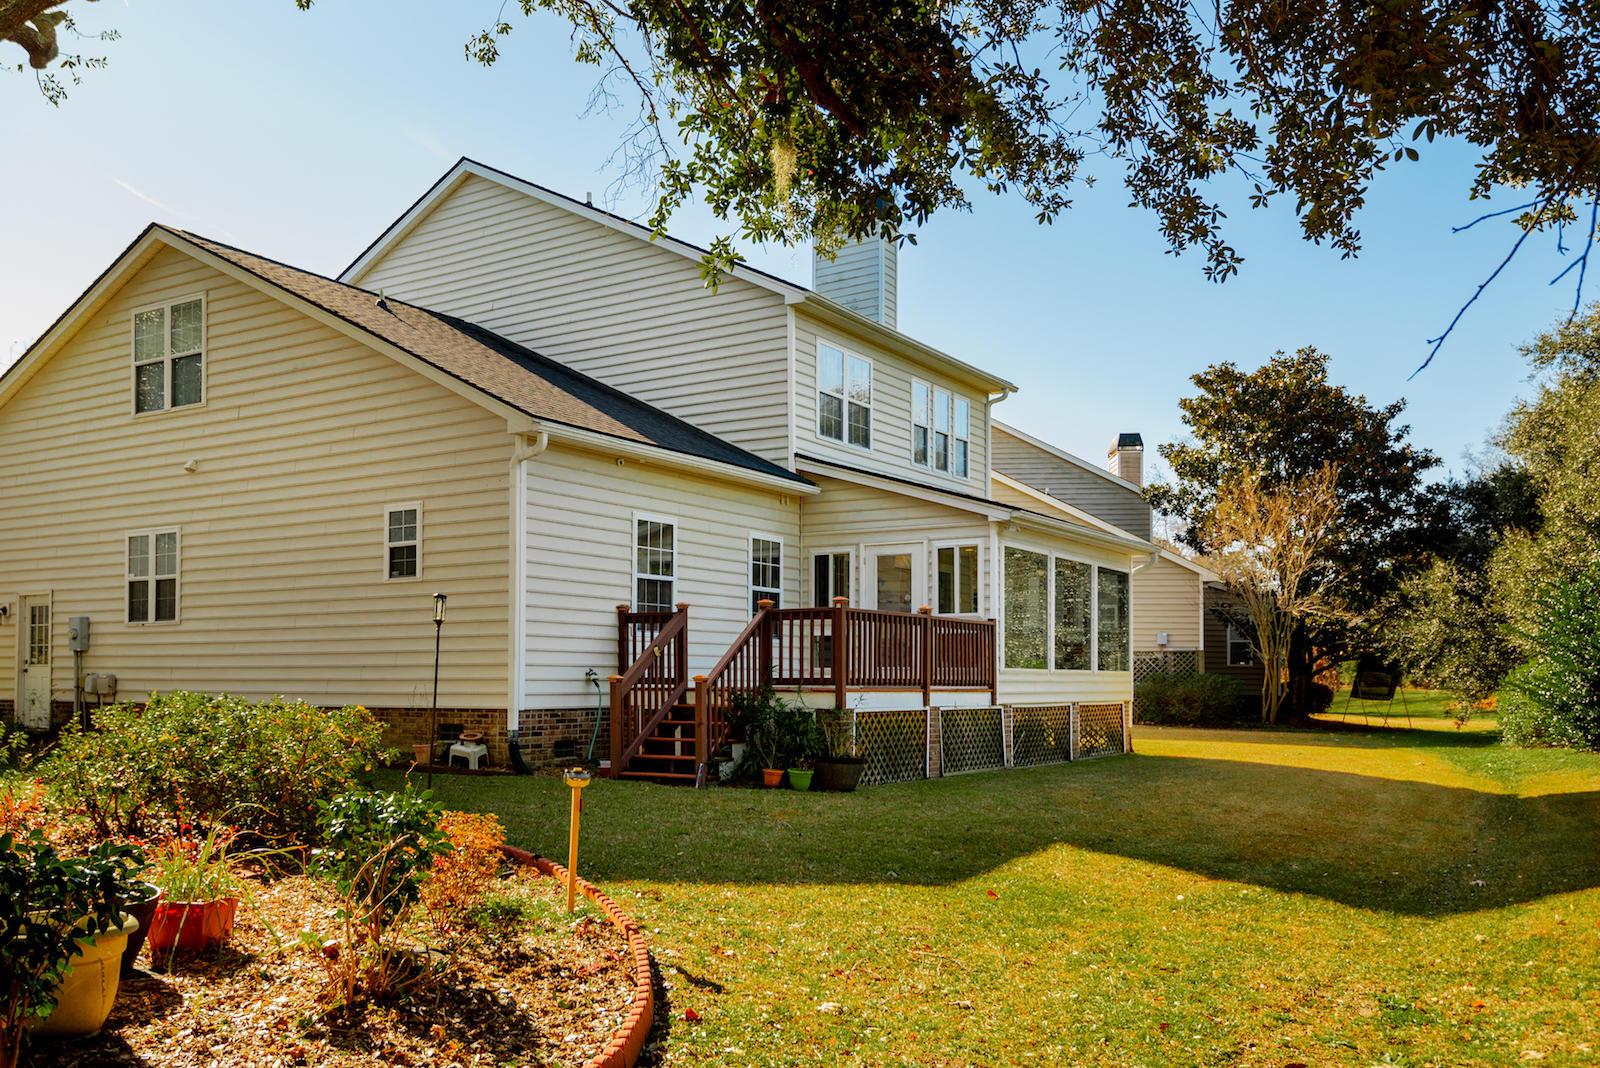 Belle Hall Homes For Sale - 195 Revetment, Mount Pleasant, SC - 4